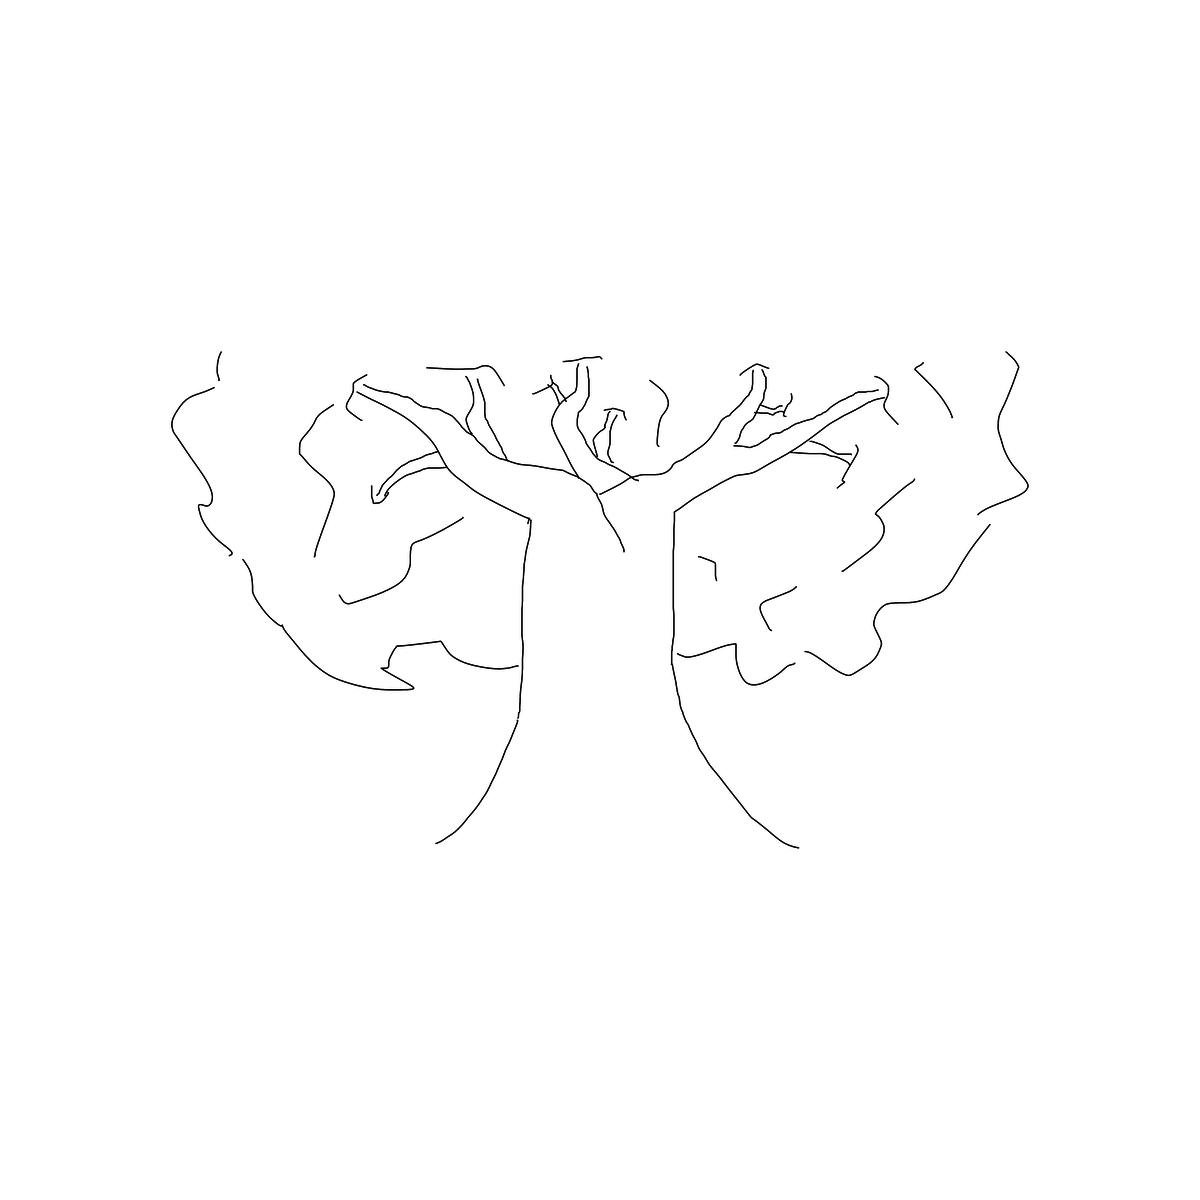 BAAAM drawing#5497 lat:54.2989311218261700lng: 9.6693544387817380